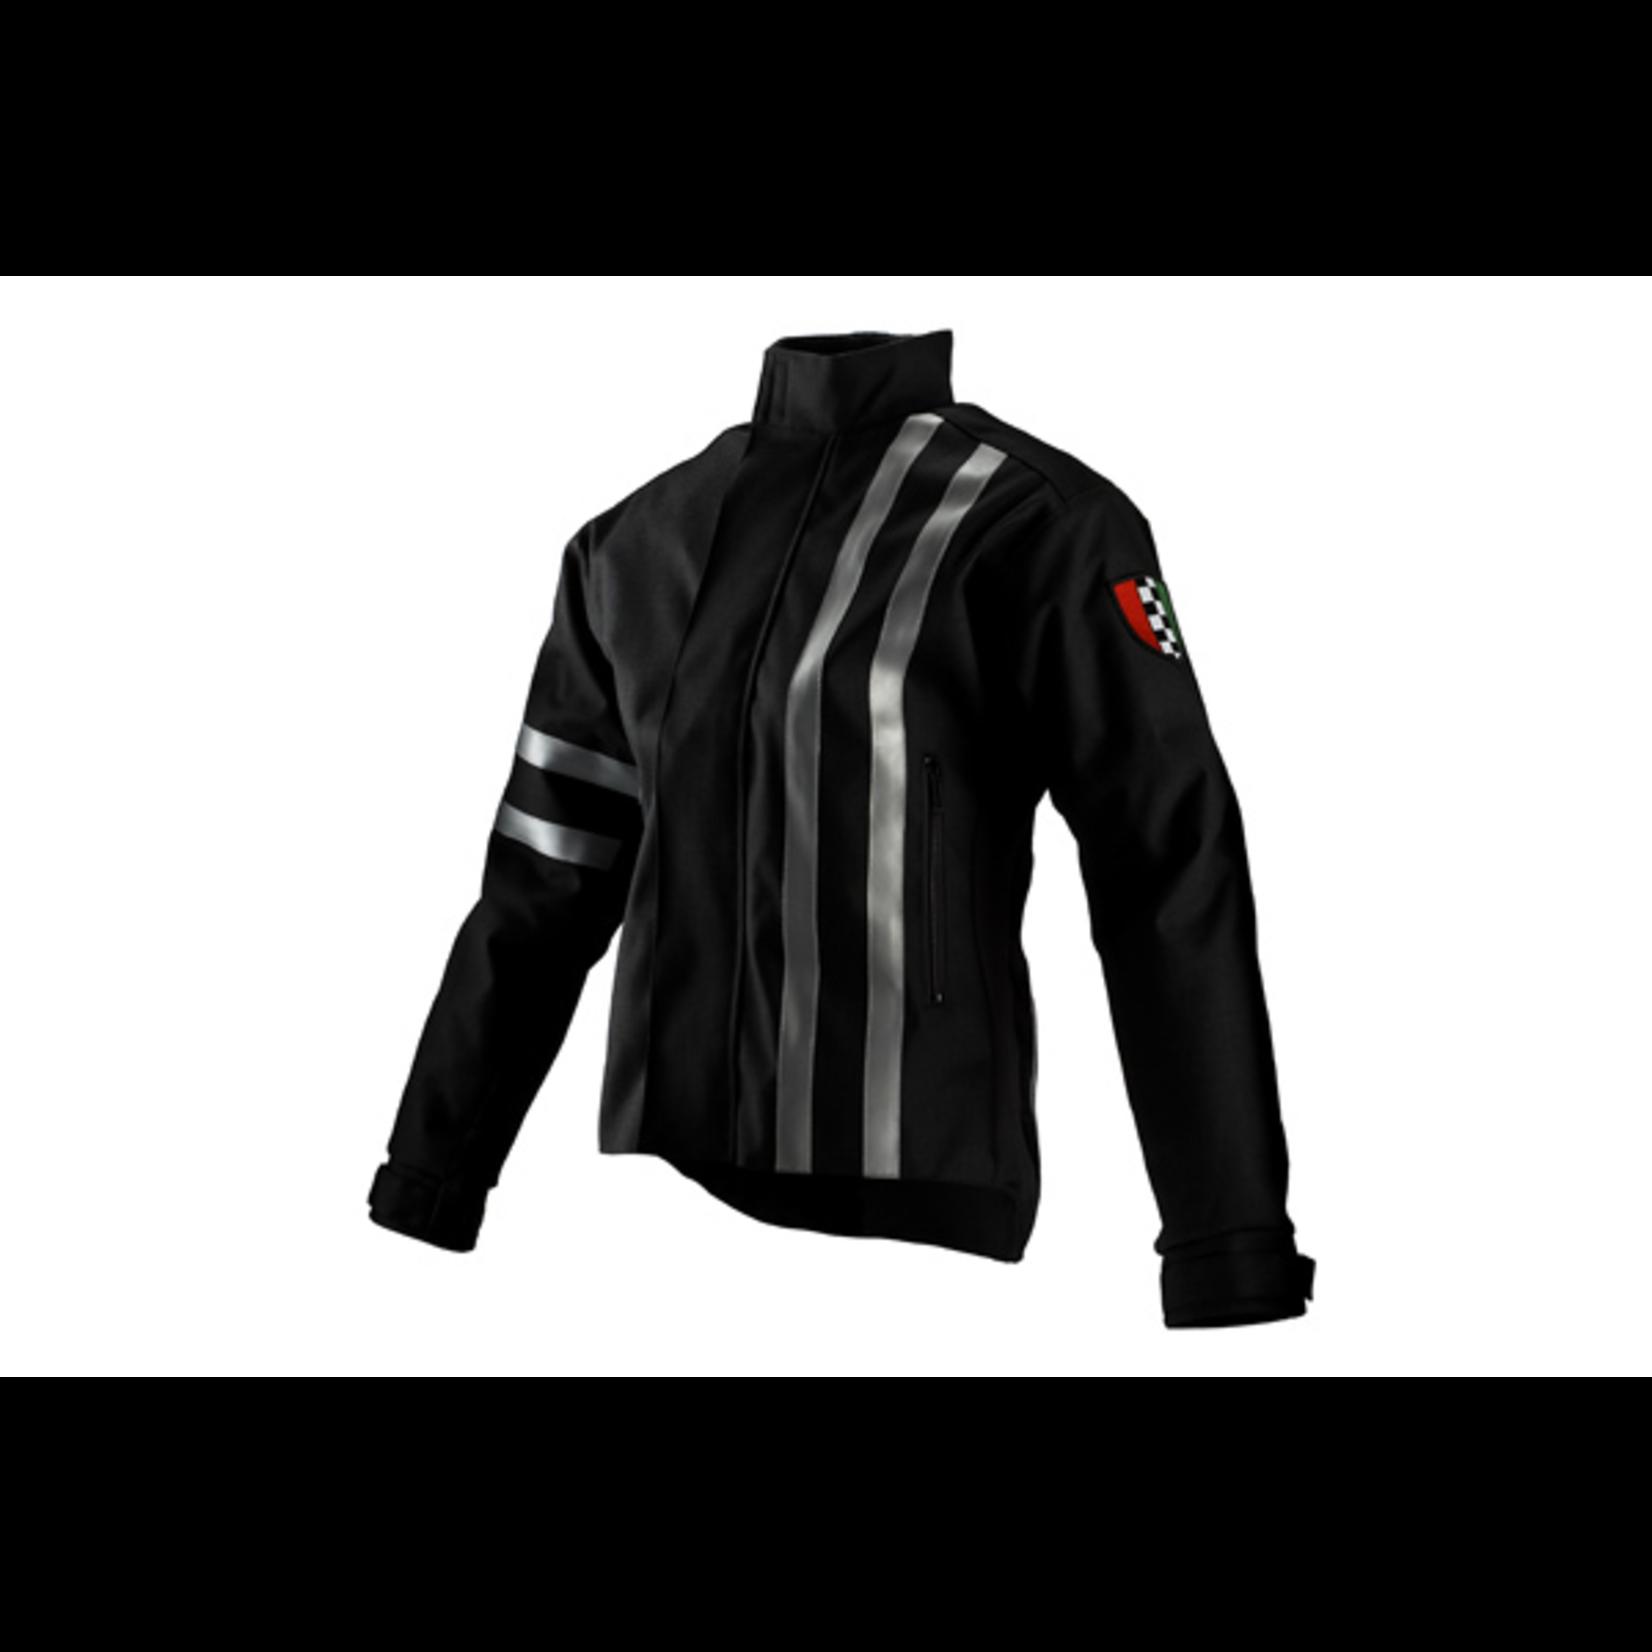 Apparel Jacket, Corazzo Women's 5.0 Black (Black Stripe) XL